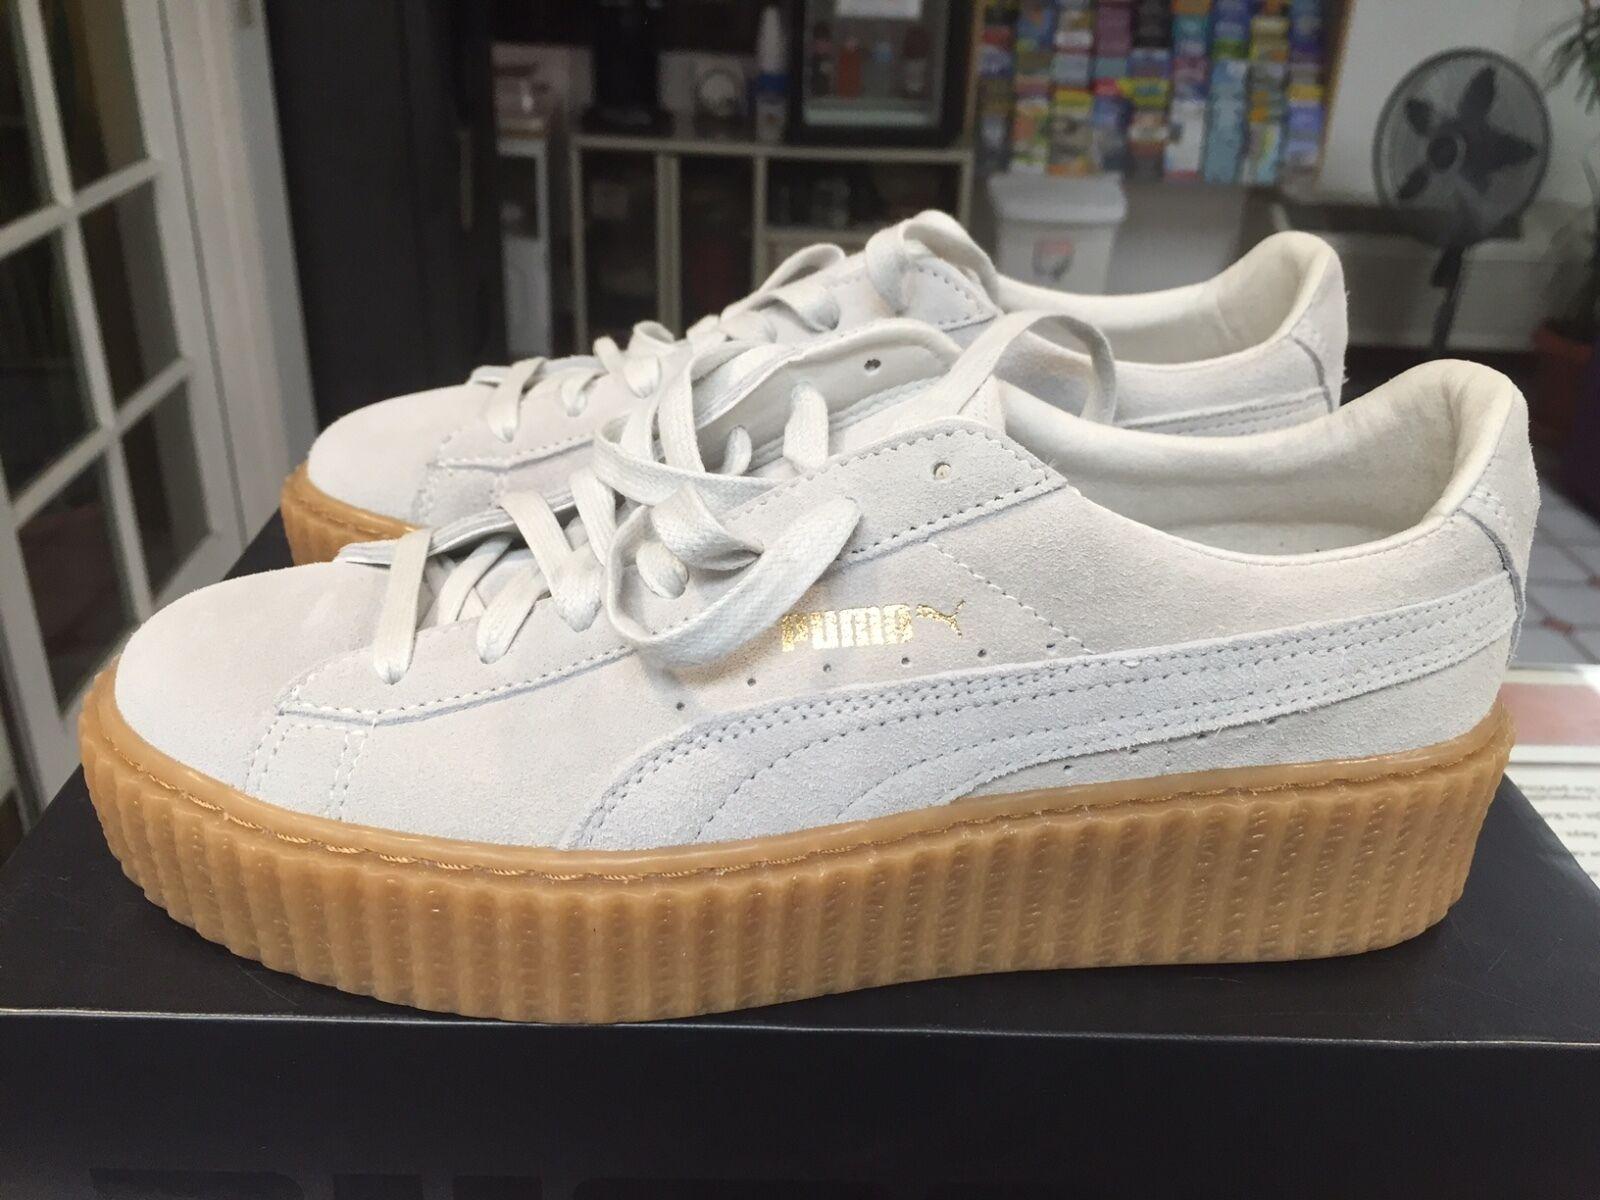 Puma X Rihanna Suede Creeper Sneaker White Womens Star White Oatmeal 361005 06